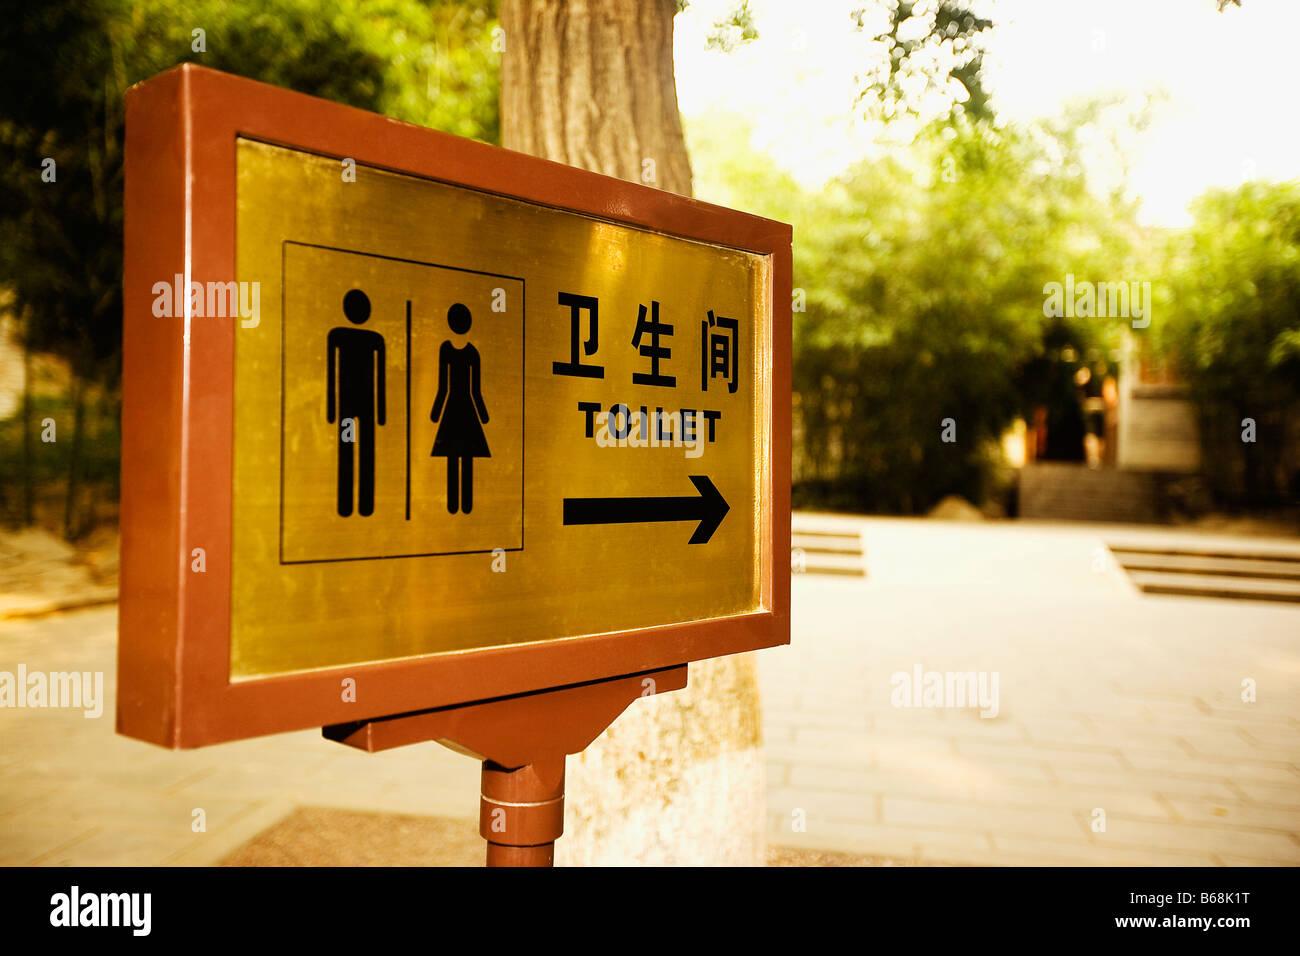 Close-up of a restroom sign, Beihai Park, Beijing, China - Stock Image